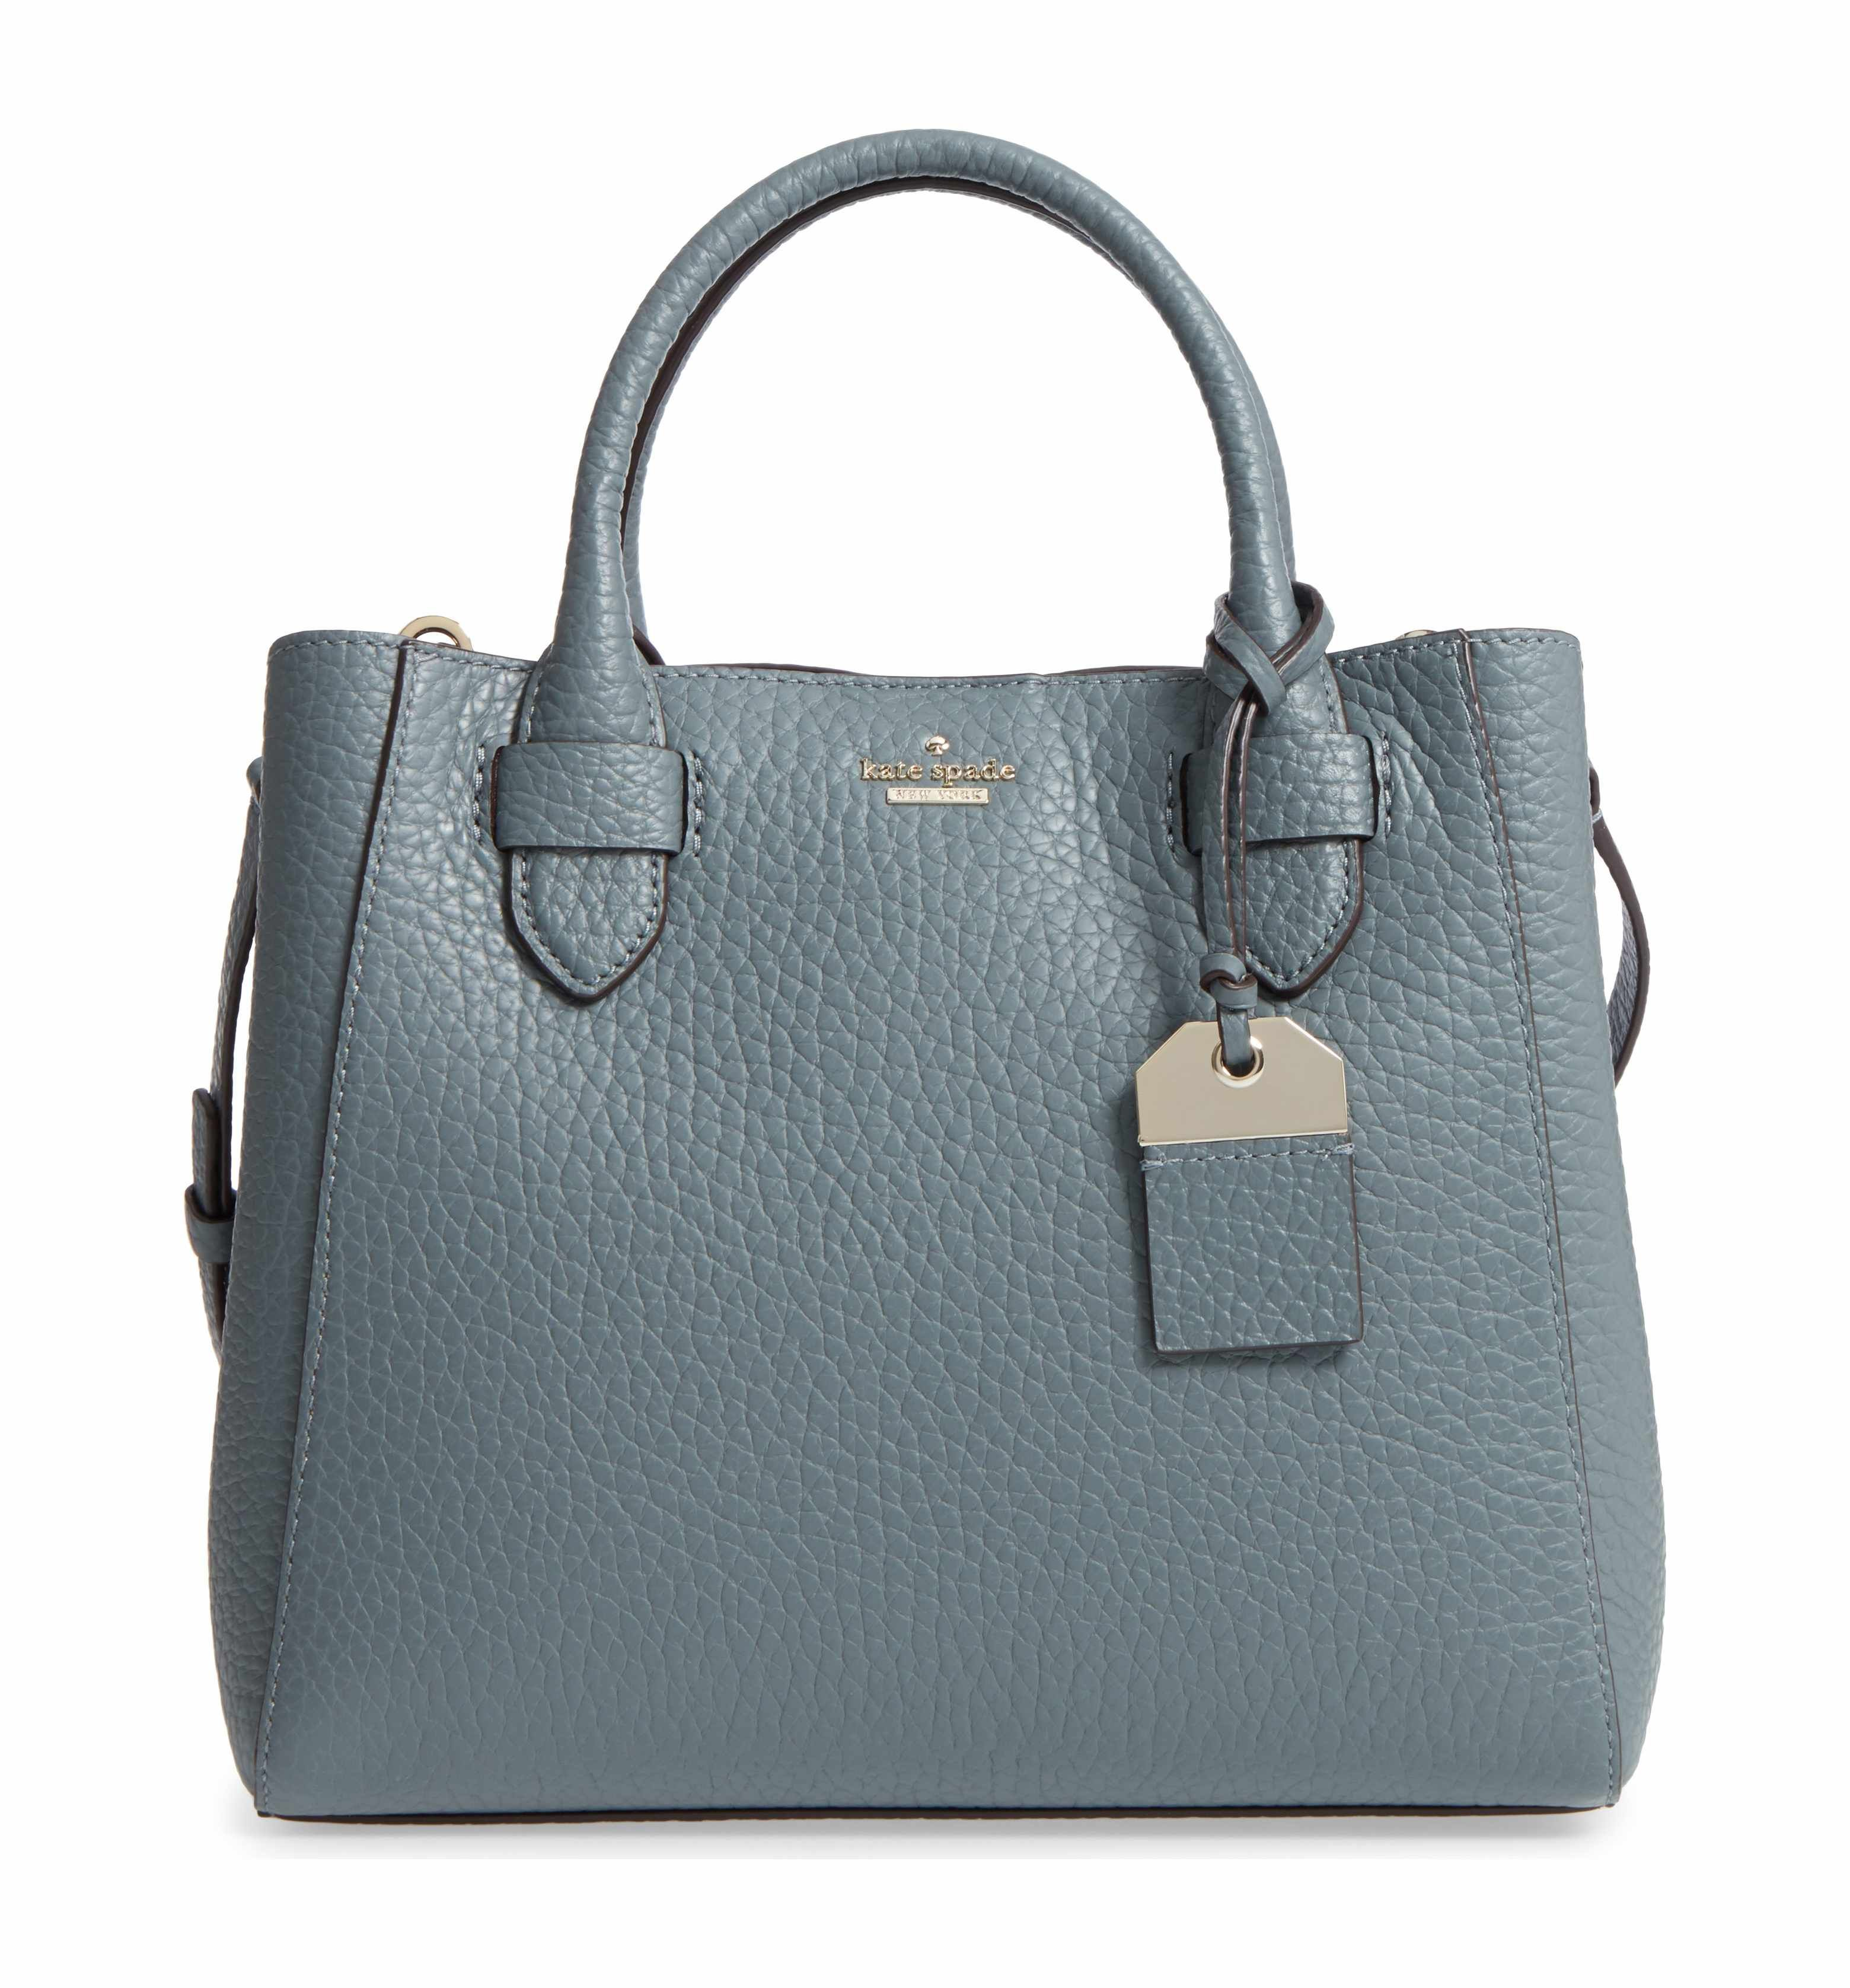 9b84163e3da3 Main Image - kate spade new york carter street - devlin leather satchel